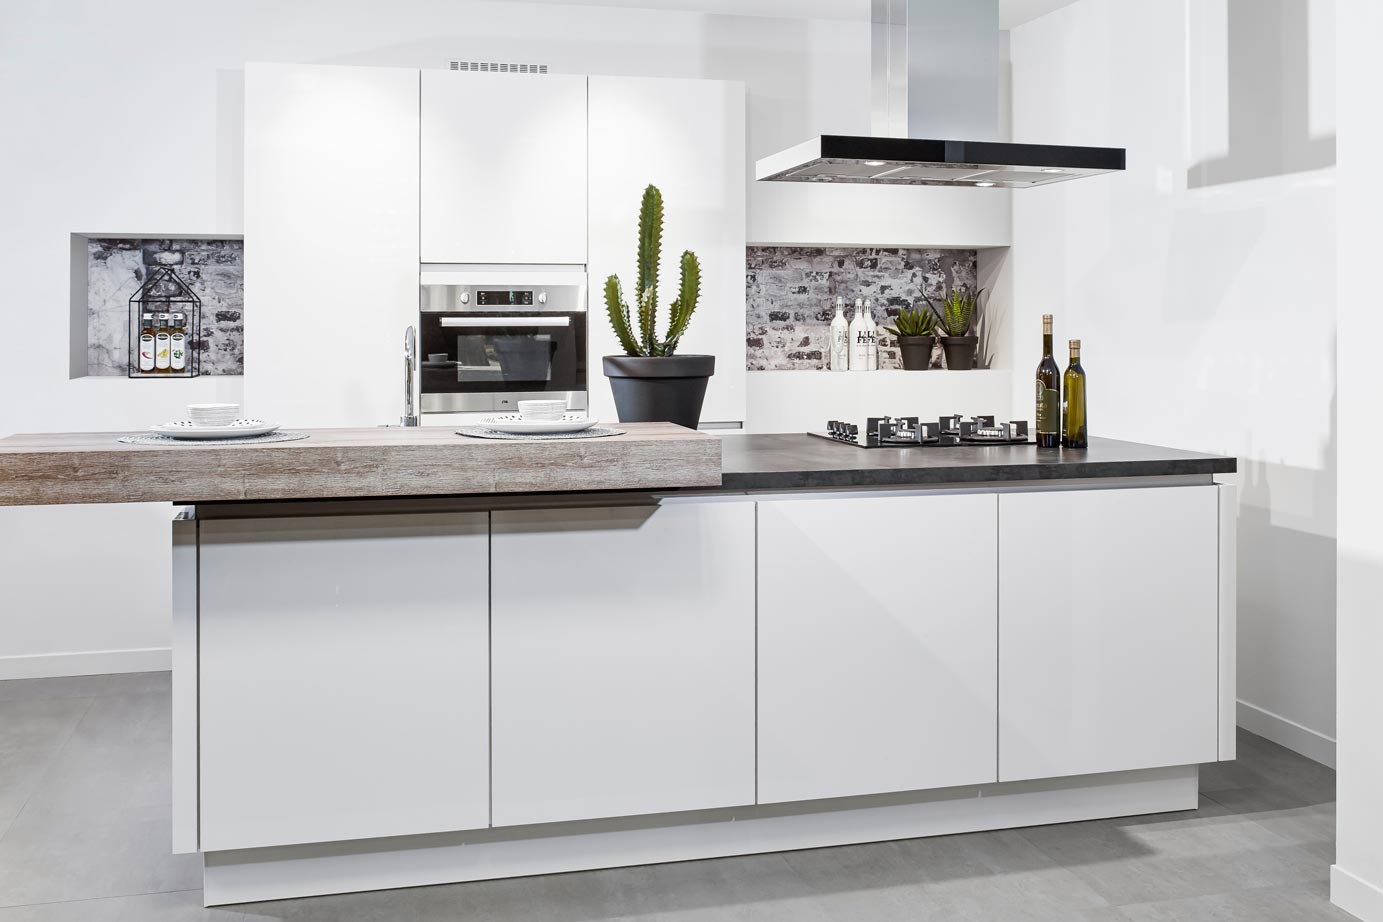 Goedkope Keukens Op Maat : Goedkope keukens Bij ons is goedkoop geen duurkoop